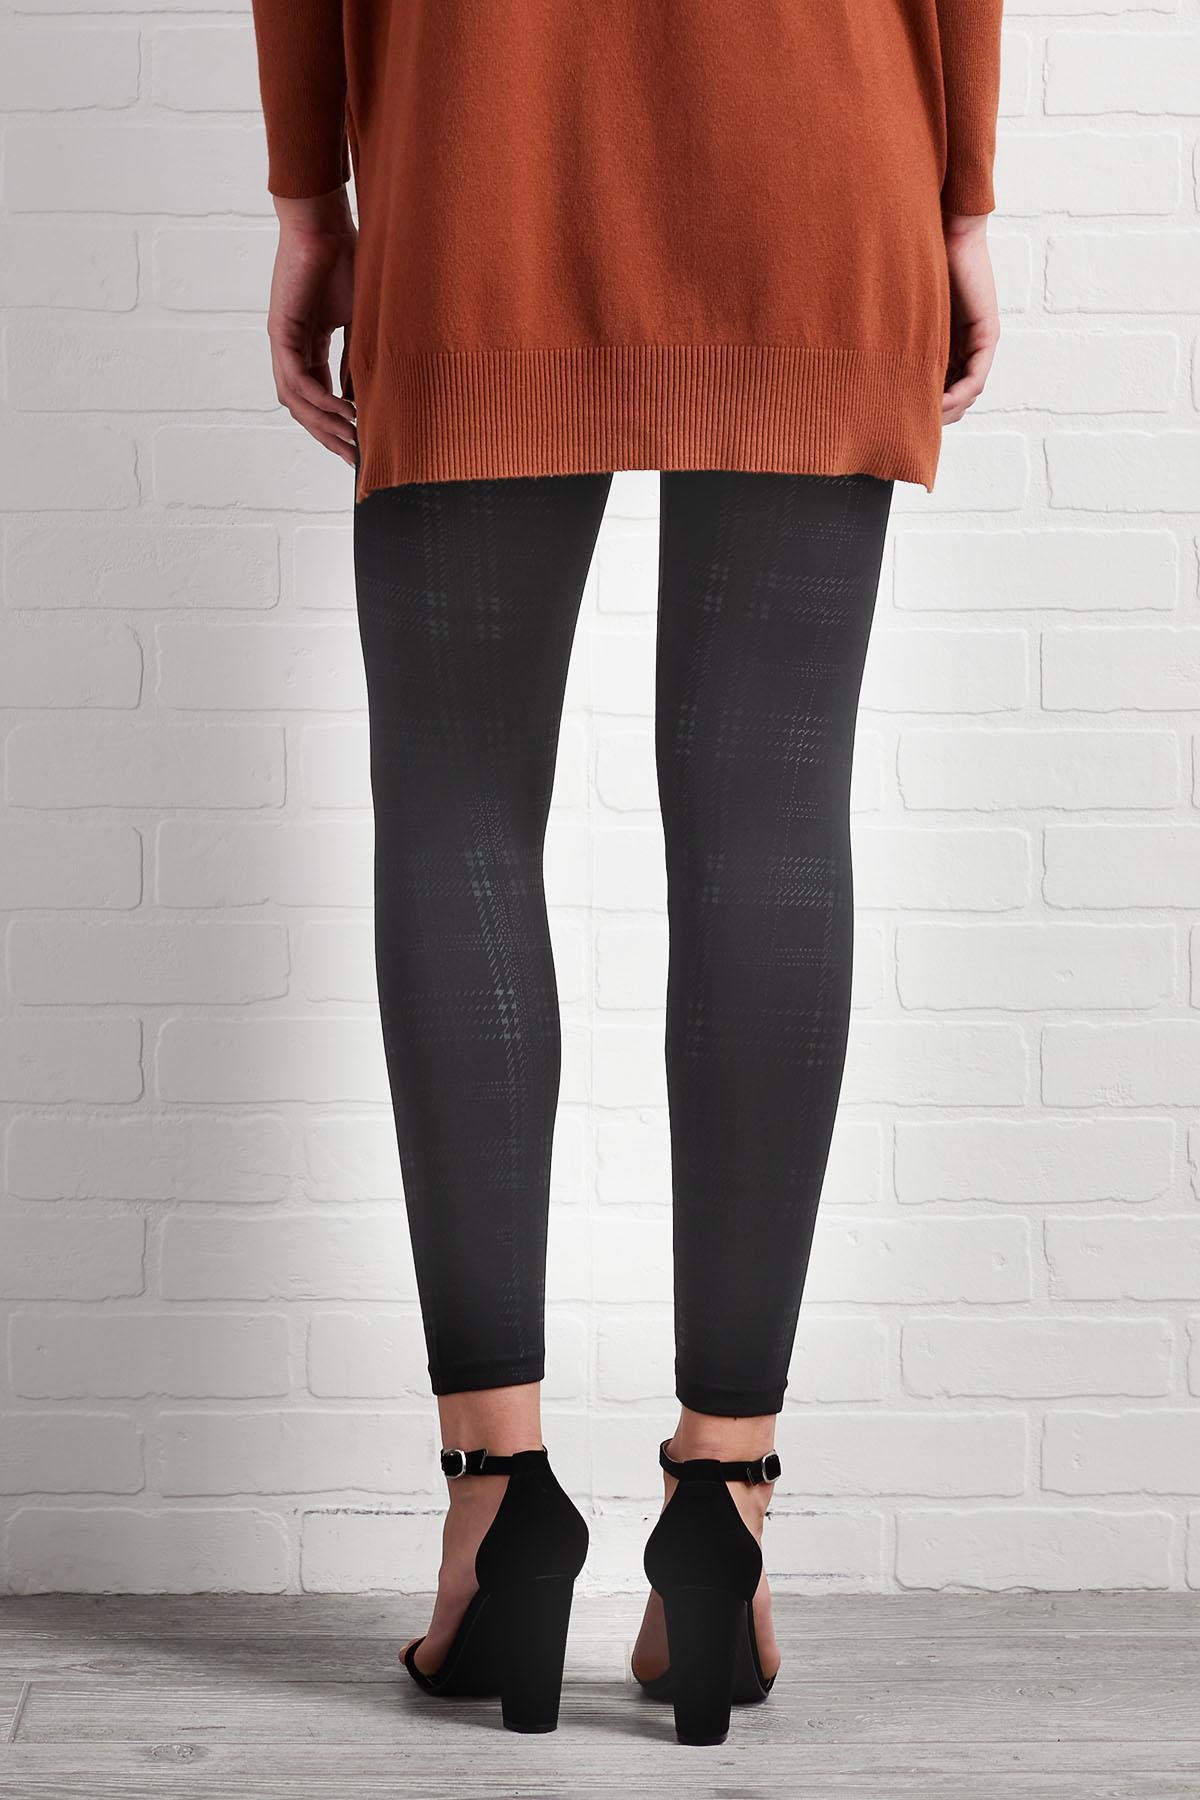 Do As You Fleece Lined Leggings